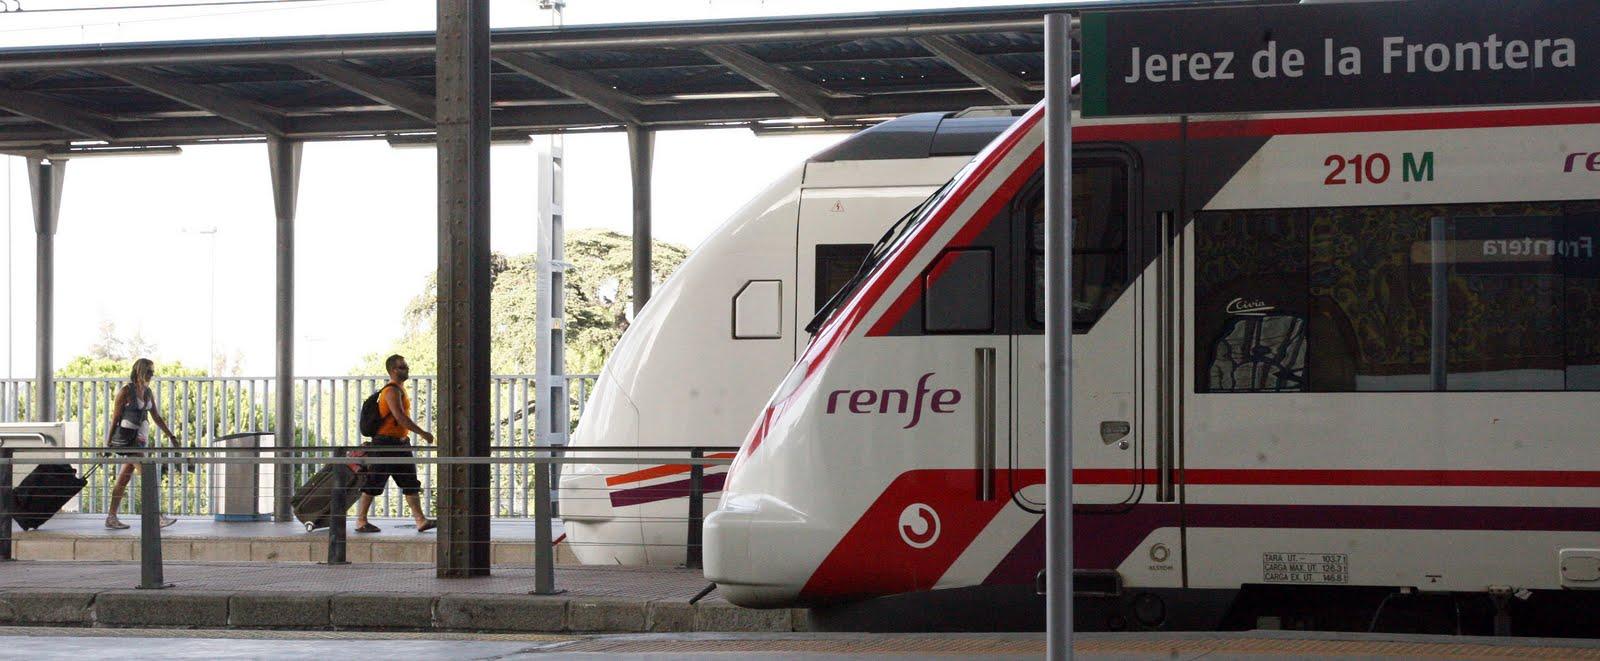 estacion trenes Jerez 2